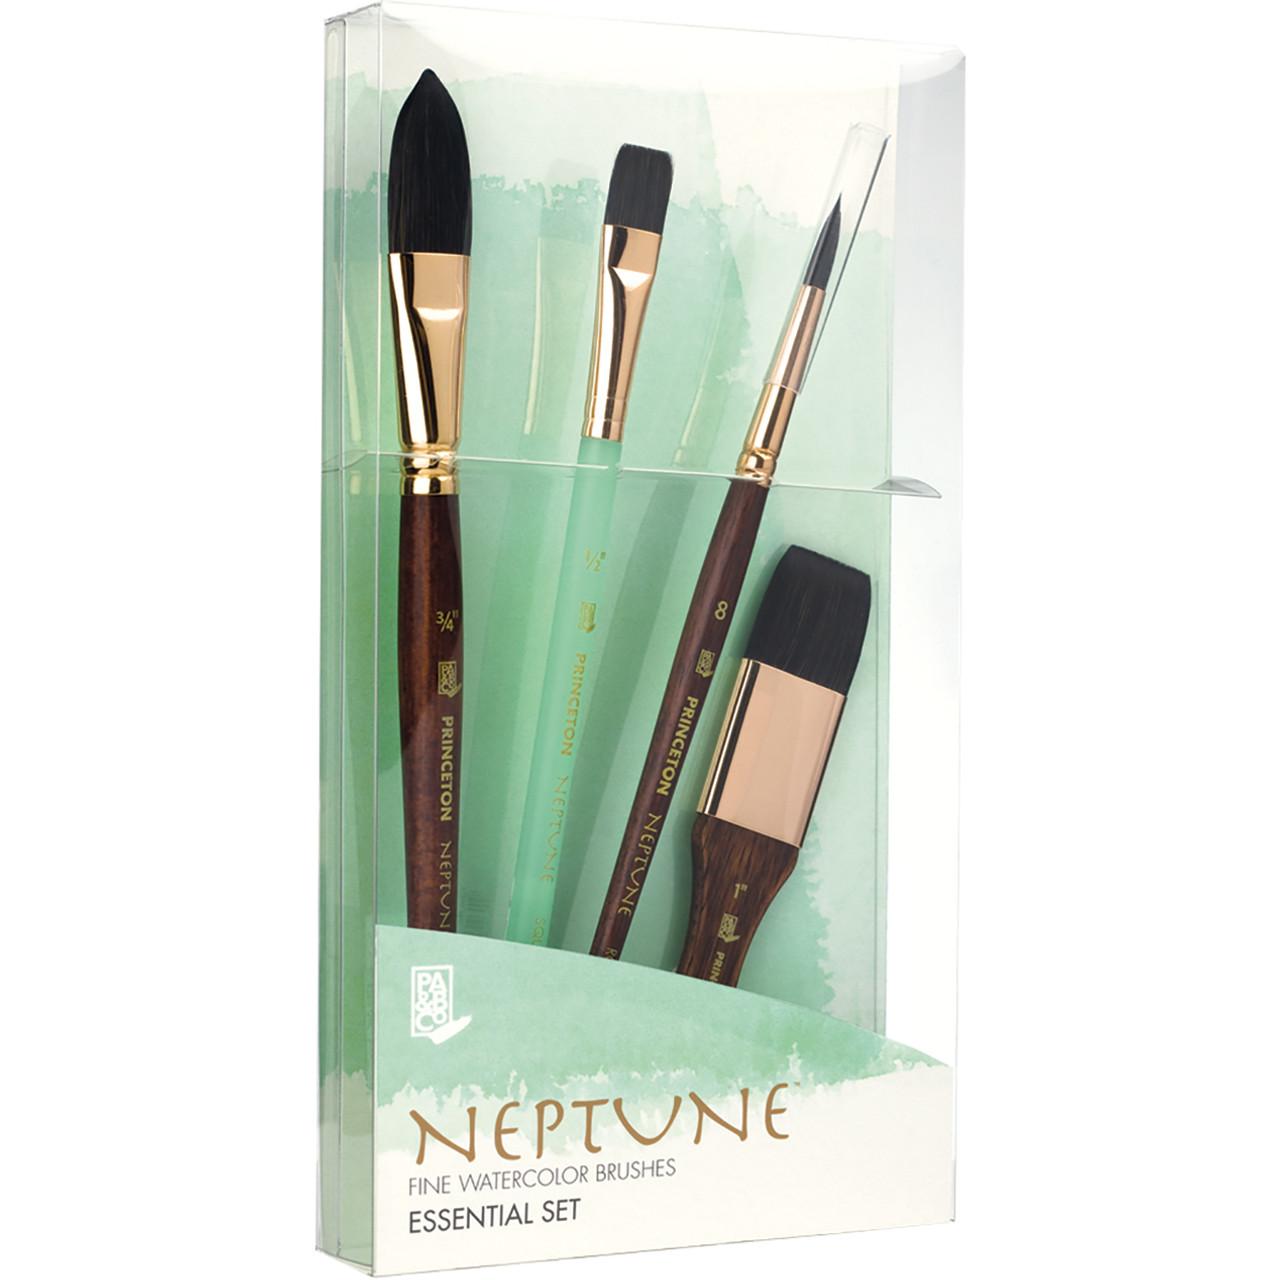 Princeton Neptune Professional 4-brush Box Set